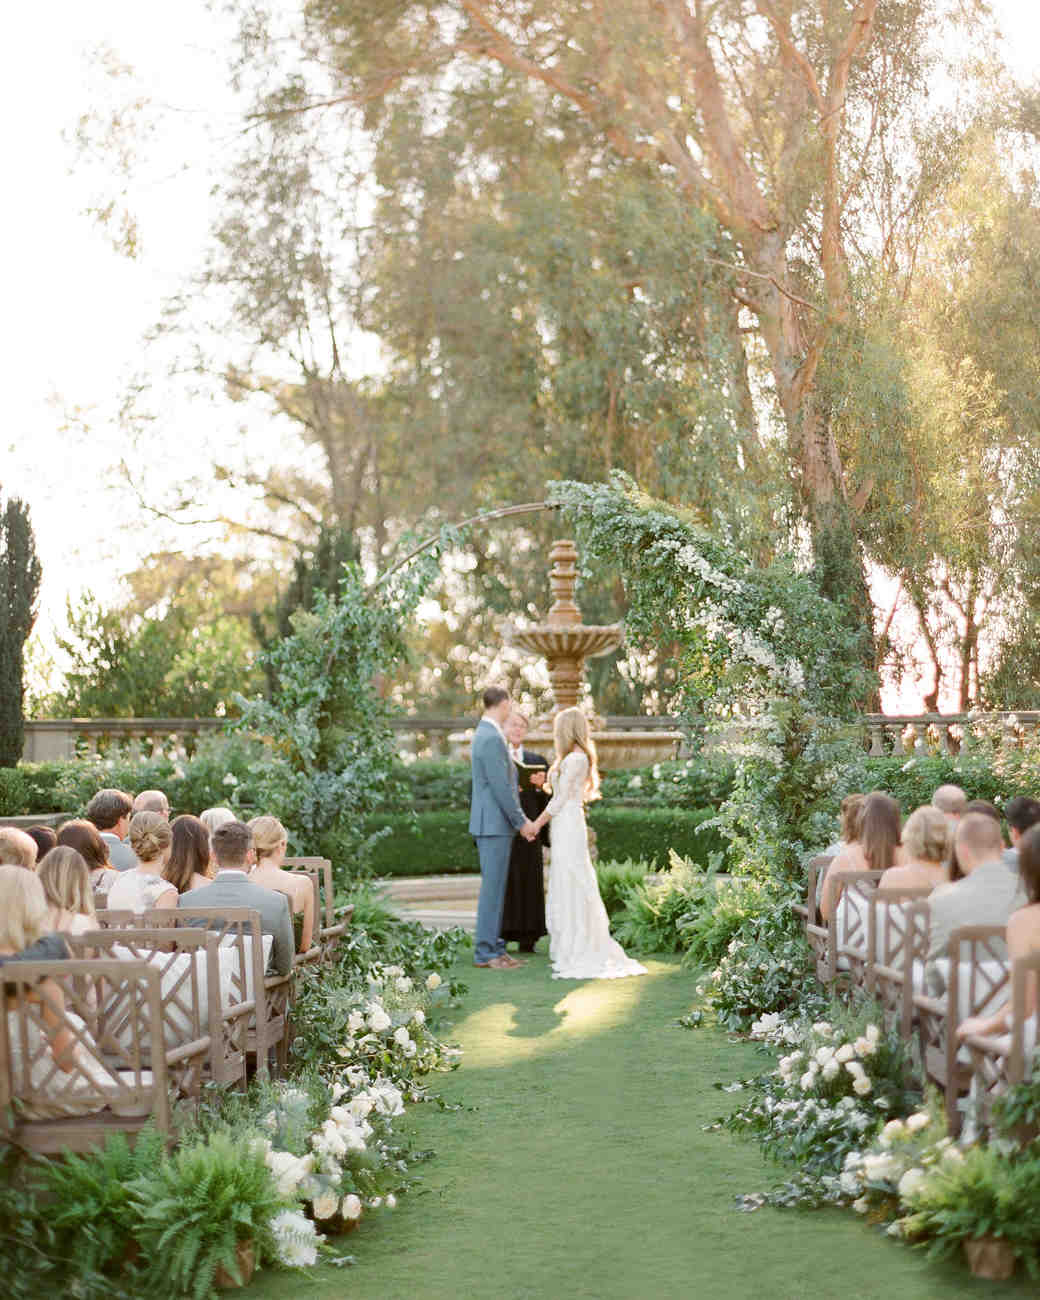 lily-jonathan-wedding-california-66210003-s112482.jpg